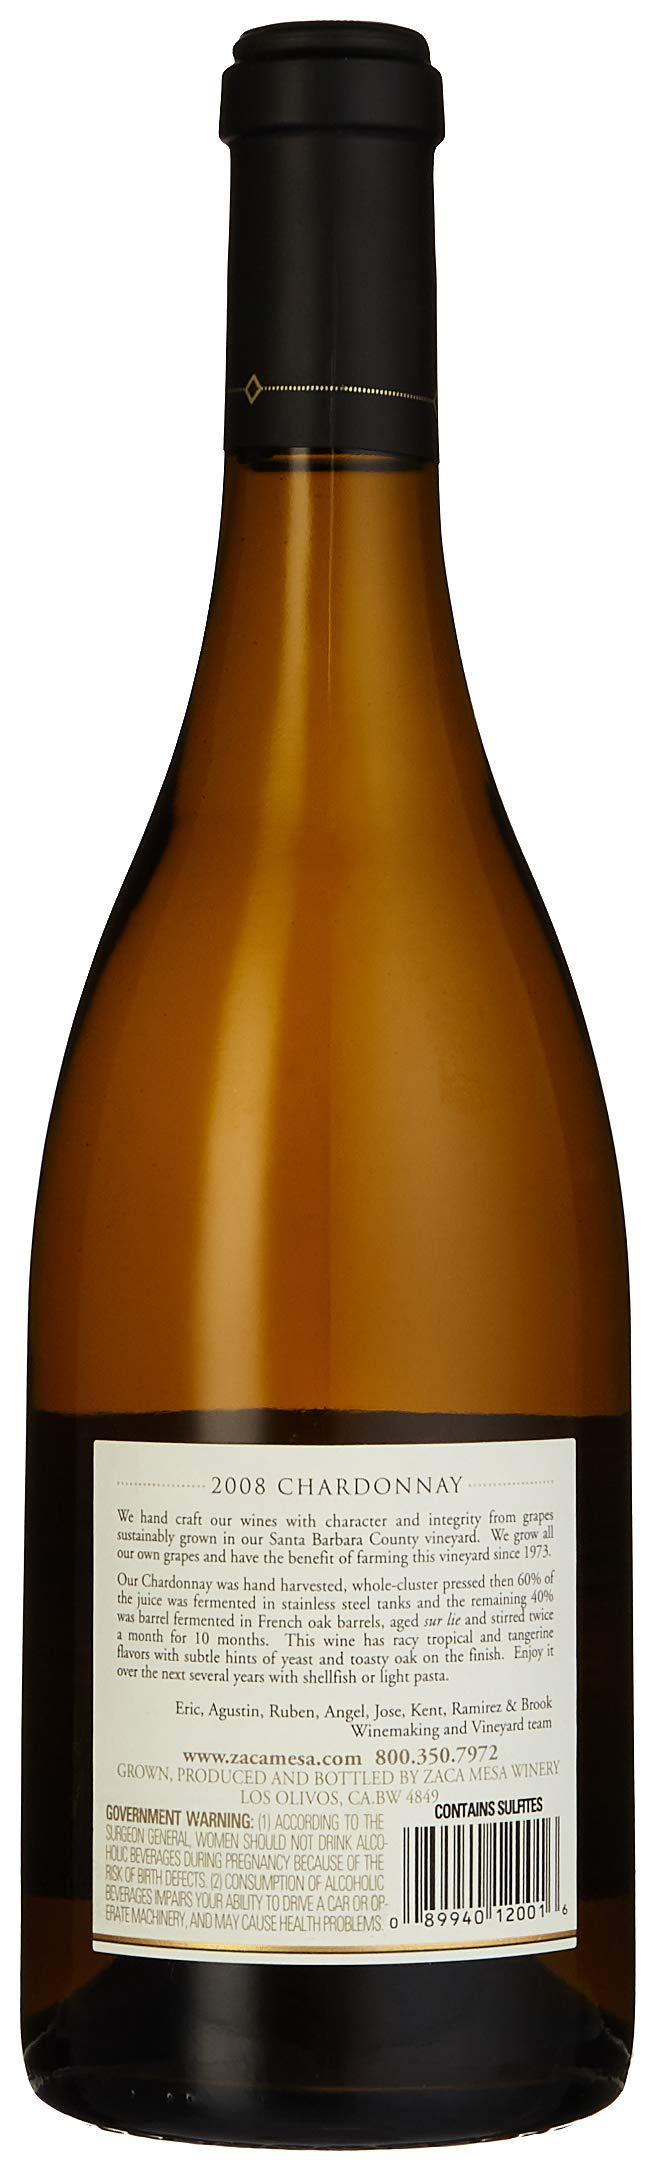 Zaca-Mesa-Chardonnay-2008-trocken-3-x-075-l